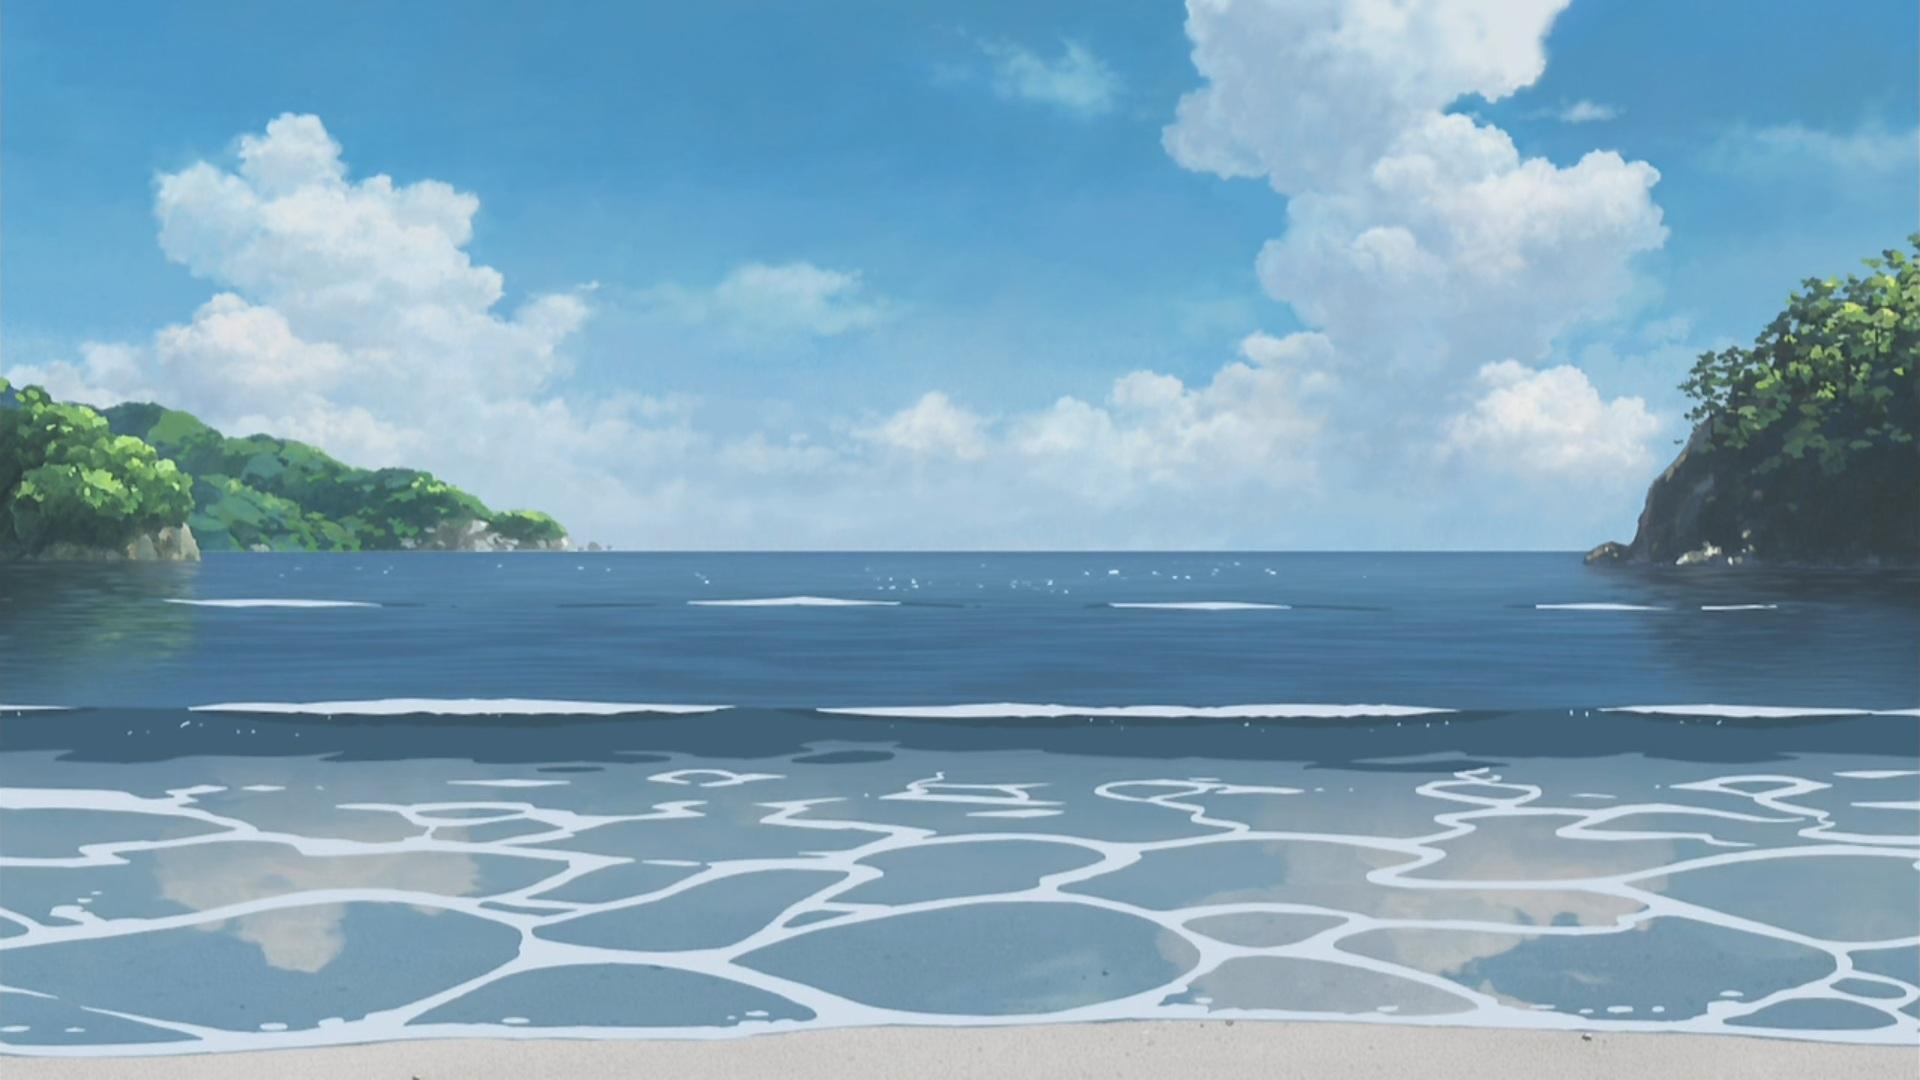 Anime scenery wallpaper wallpapersafari - Anime backgrounds hd 1920x1080 ...